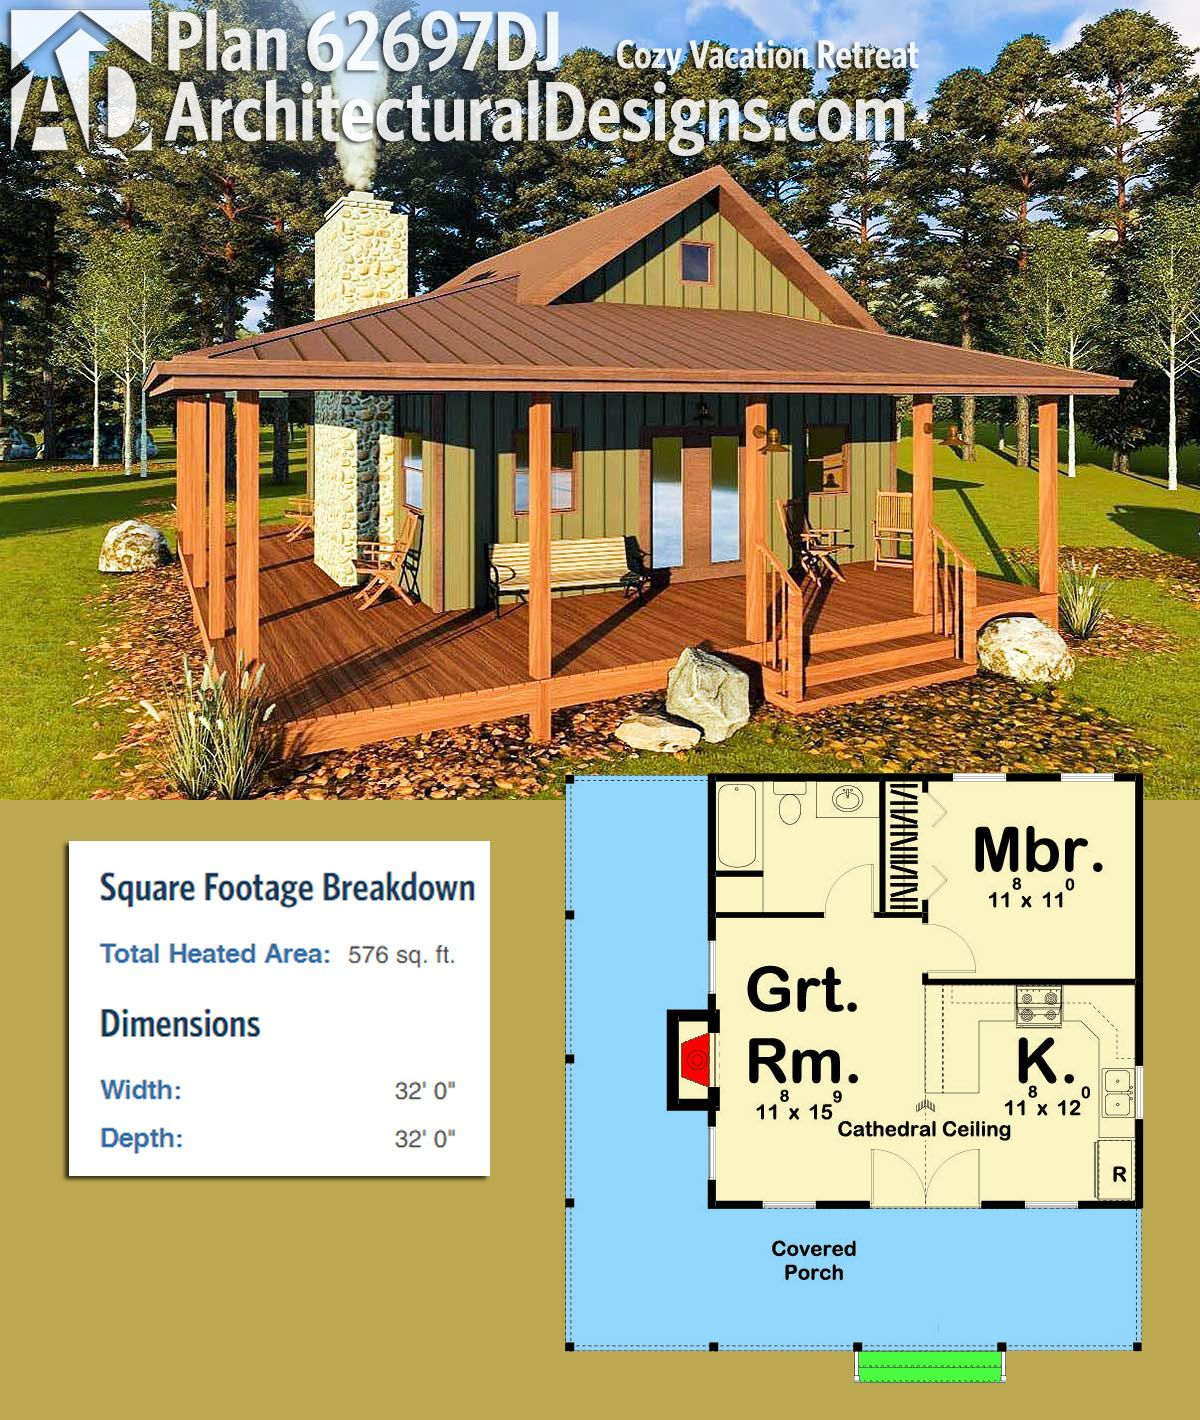 plan 62697dj cozy vacation retreat house plans tiny on best tiny house plan design ideas id=77473